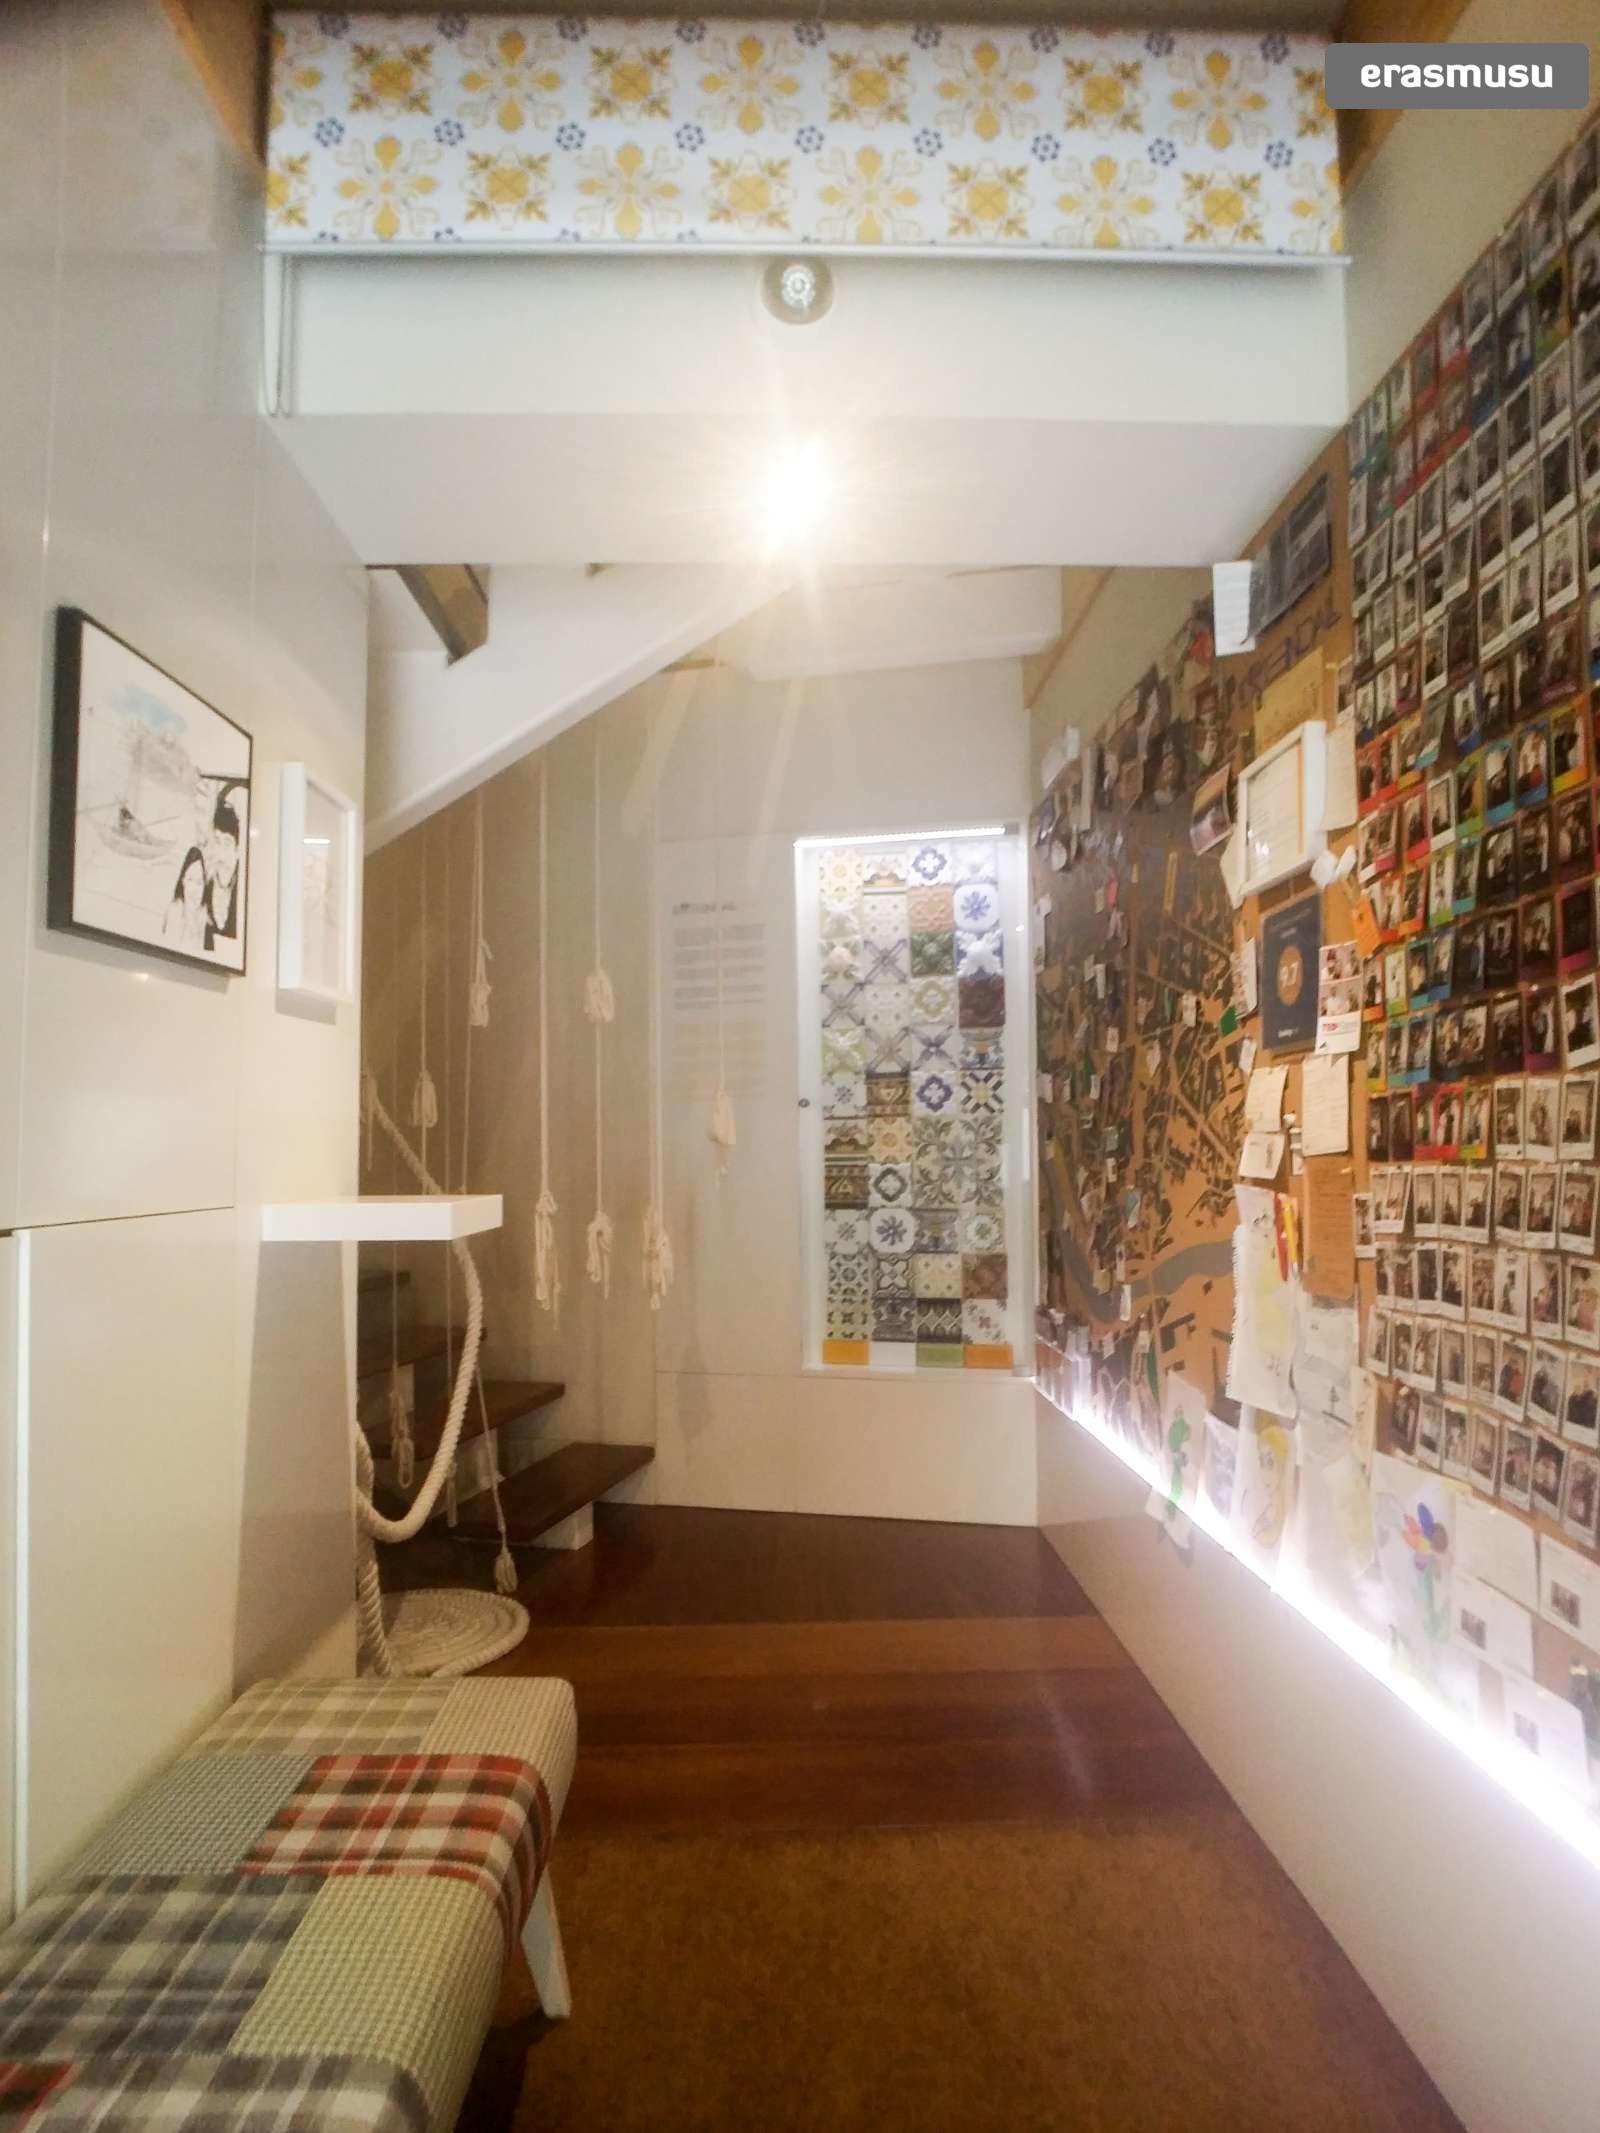 furnished-studio-apartment-rent-sao-nicolau-67109644fa42fbbd511c